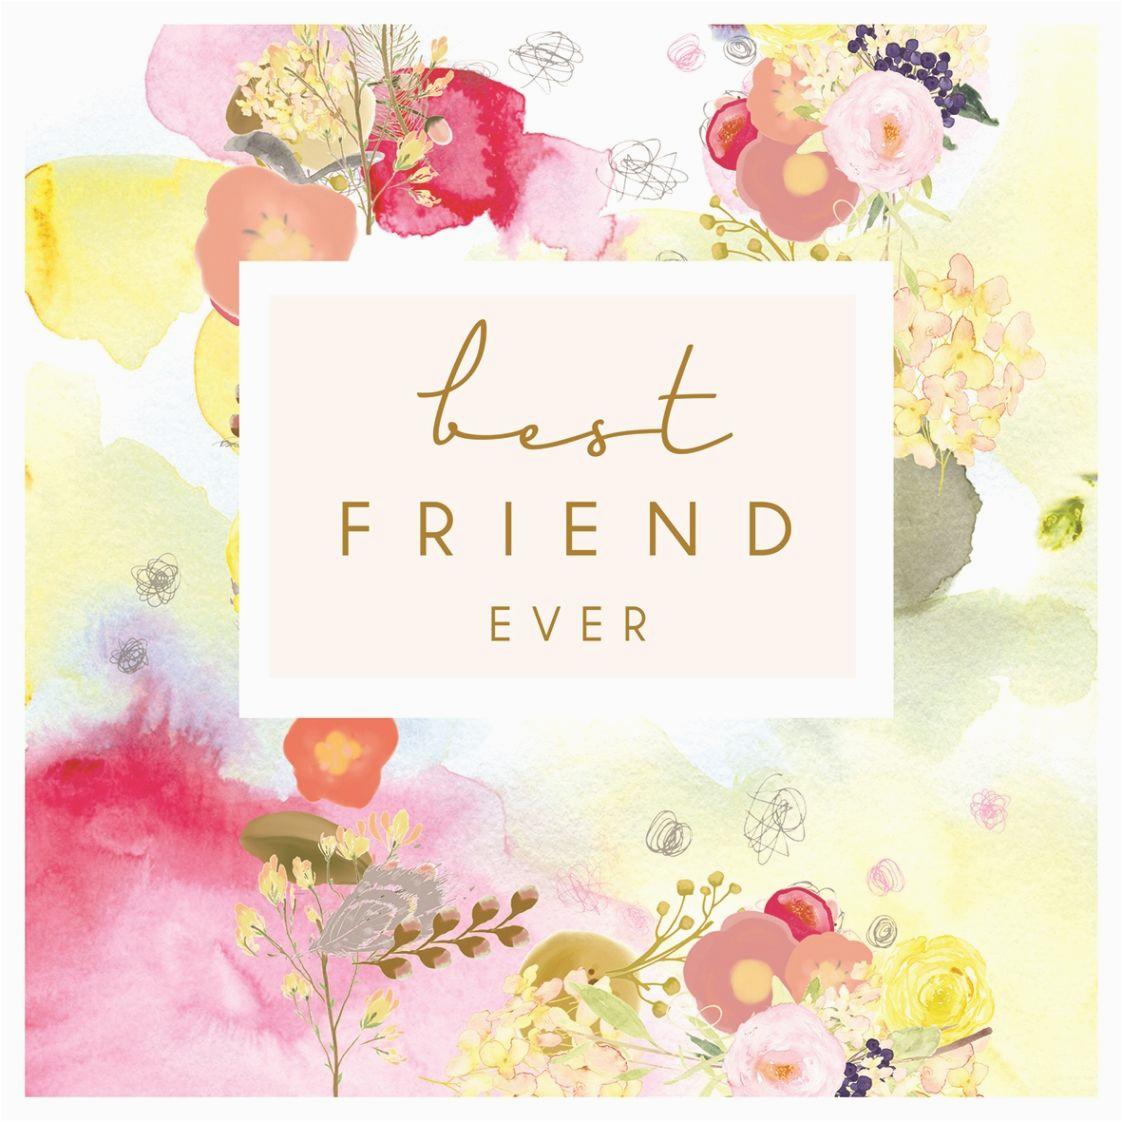 Online Birthday Cards for Best Friend Best Friend Ever Card Karenza Paperie